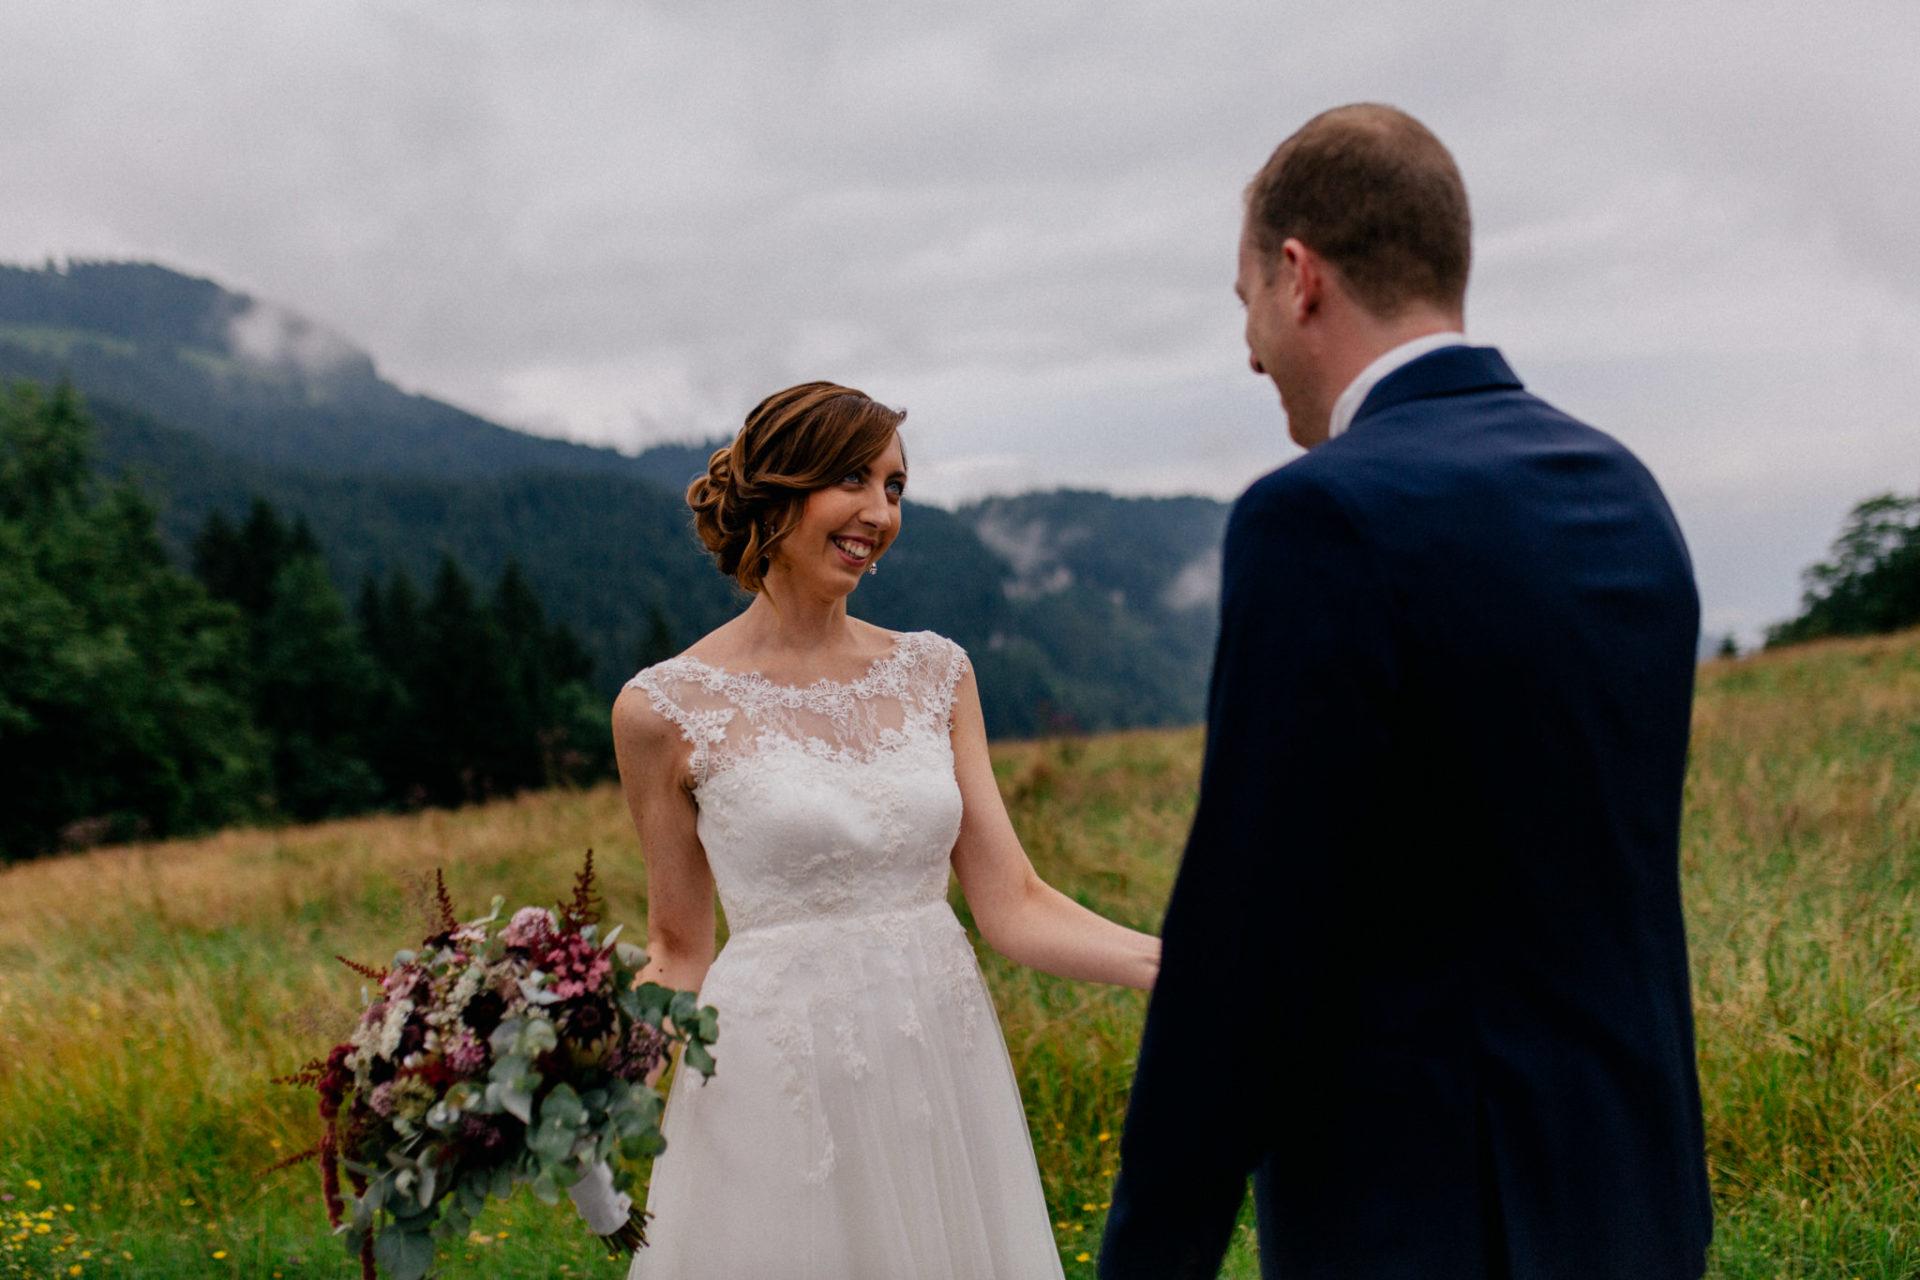 wedding photographer Lech Ahlberg-mountain wedding- bride groom first look